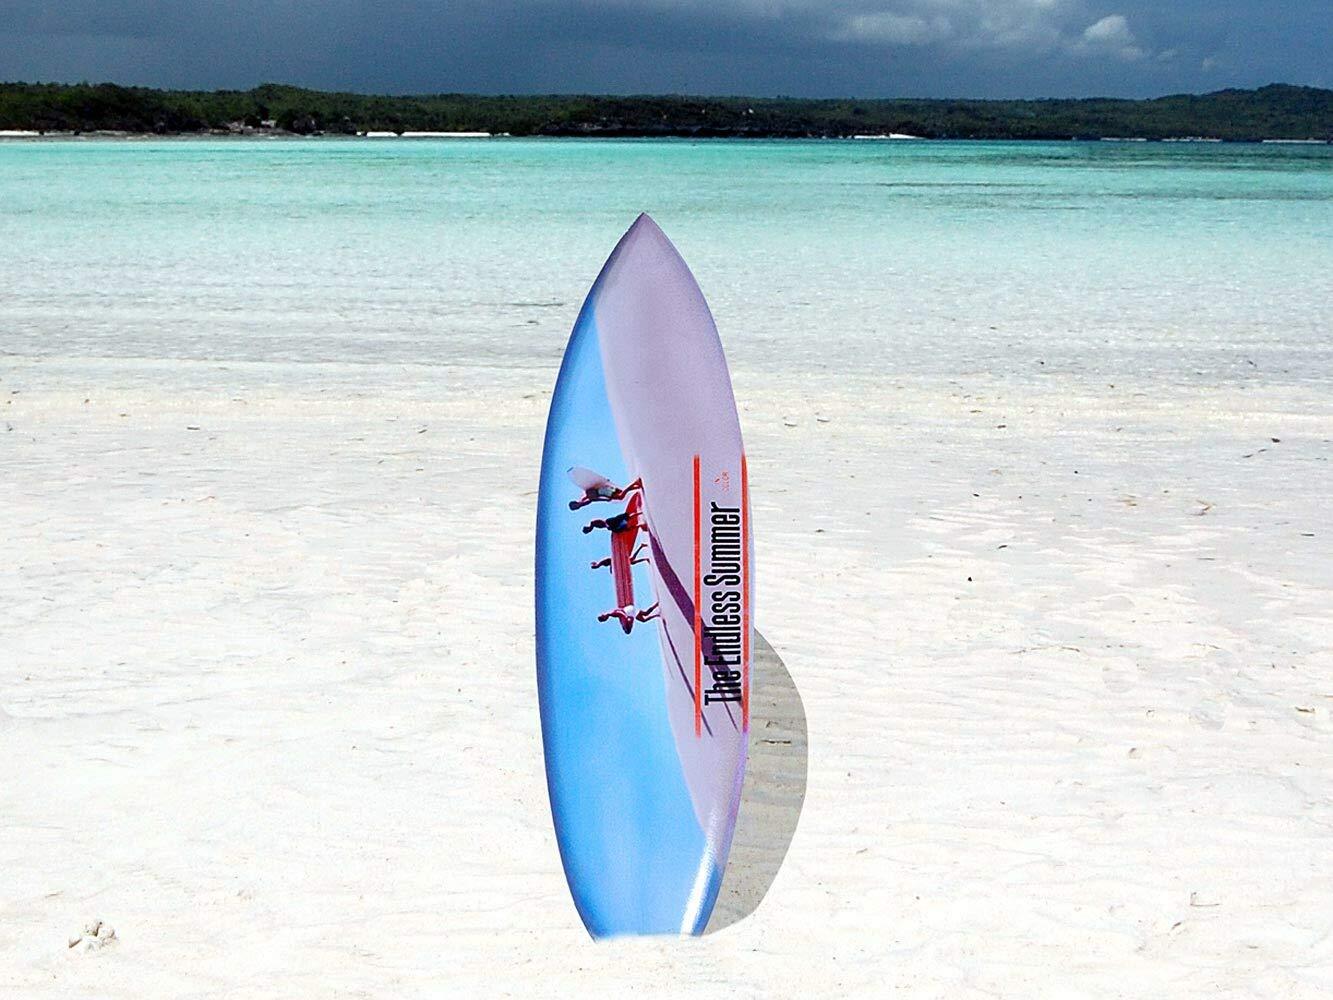 Seestern Sportswear FBA/_1856 Planche de Surf en Bois Motif a/érographe 50,80 ou 100 cm